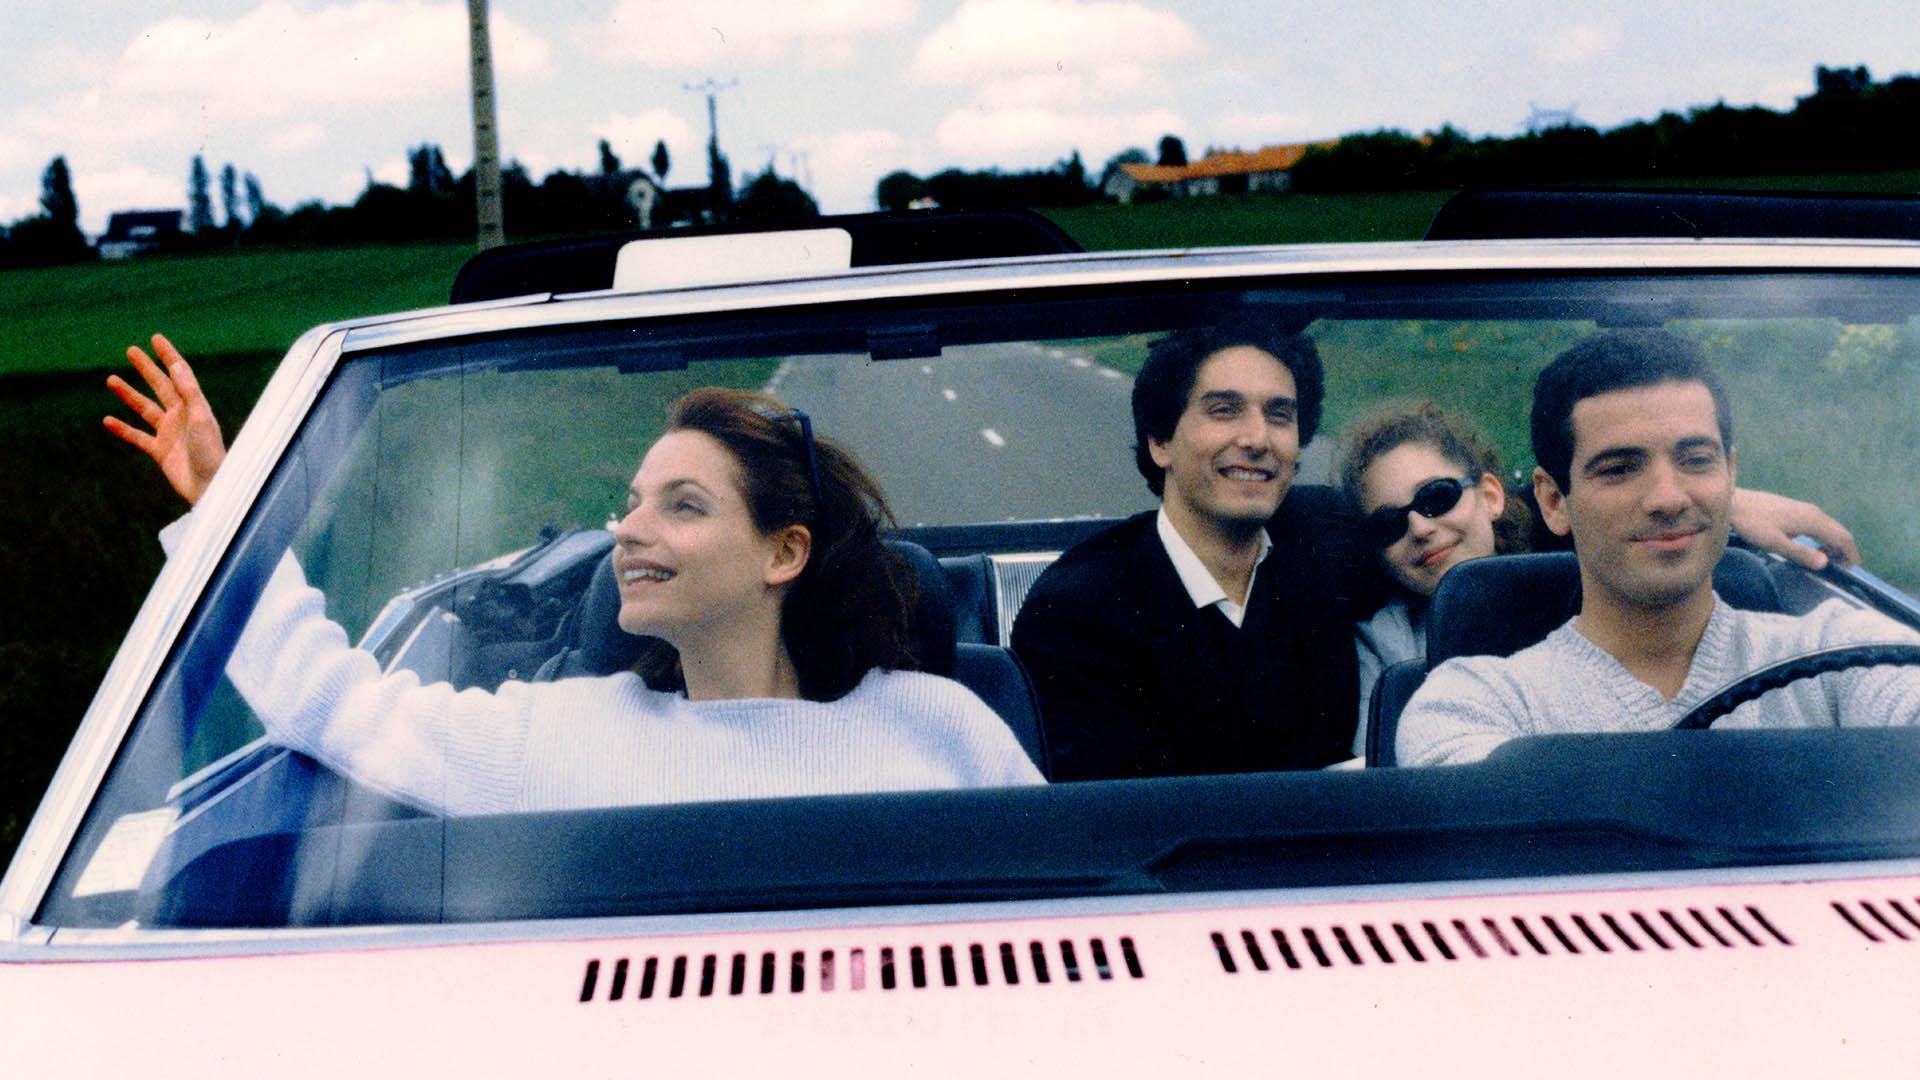 1998-petits-desodres-amoureux-img039